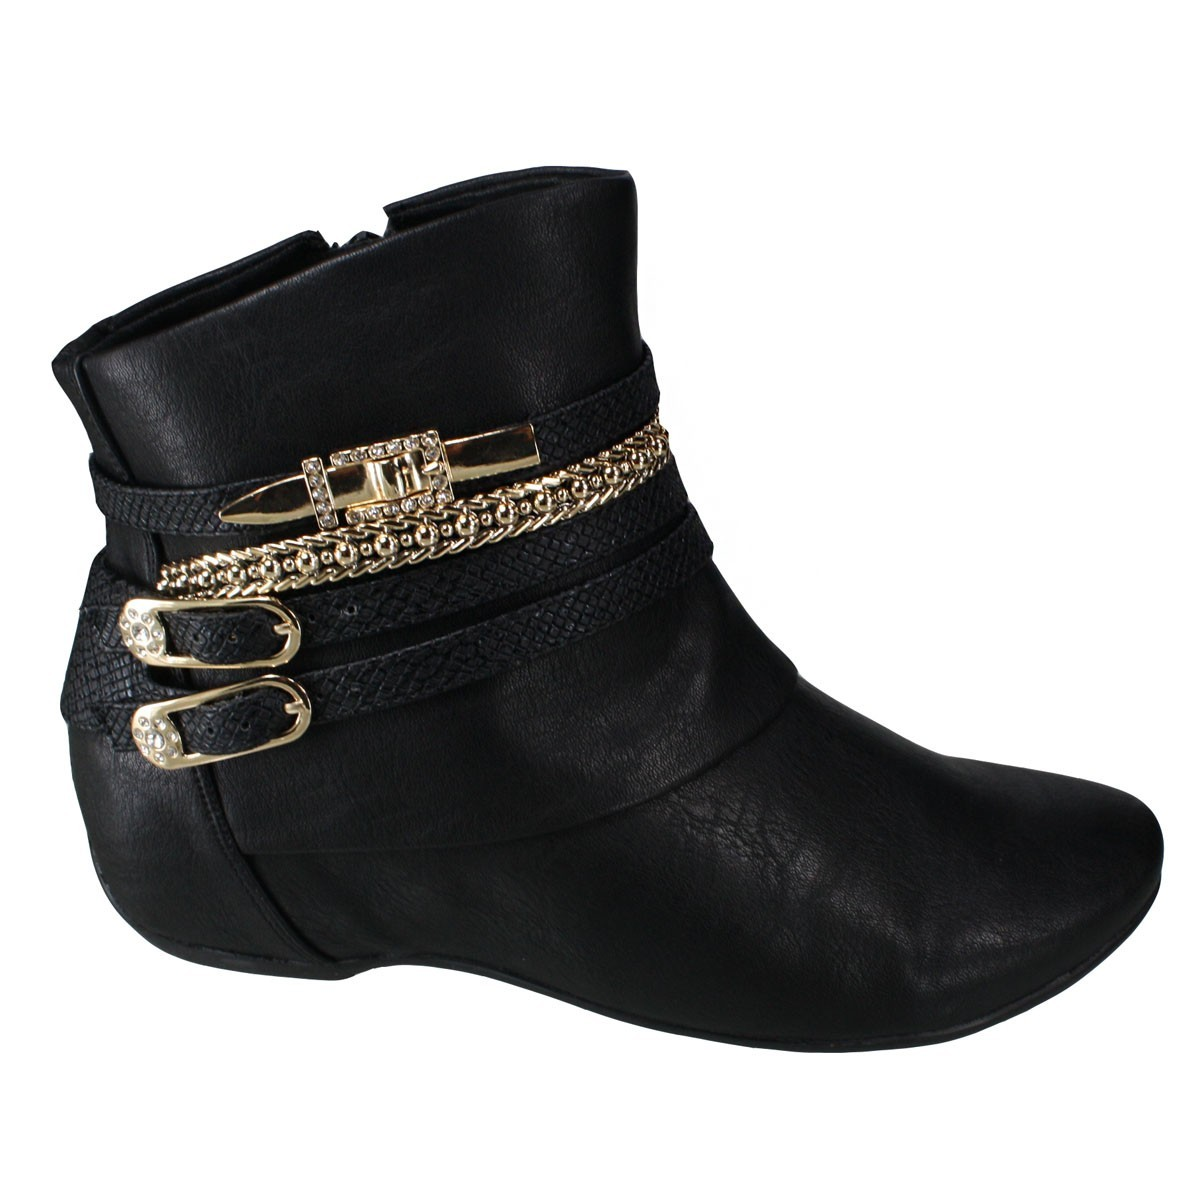 ad2dd6885 Bizz Store - Bota Feminina Comfortflex Cano Curto Preta Rasteira